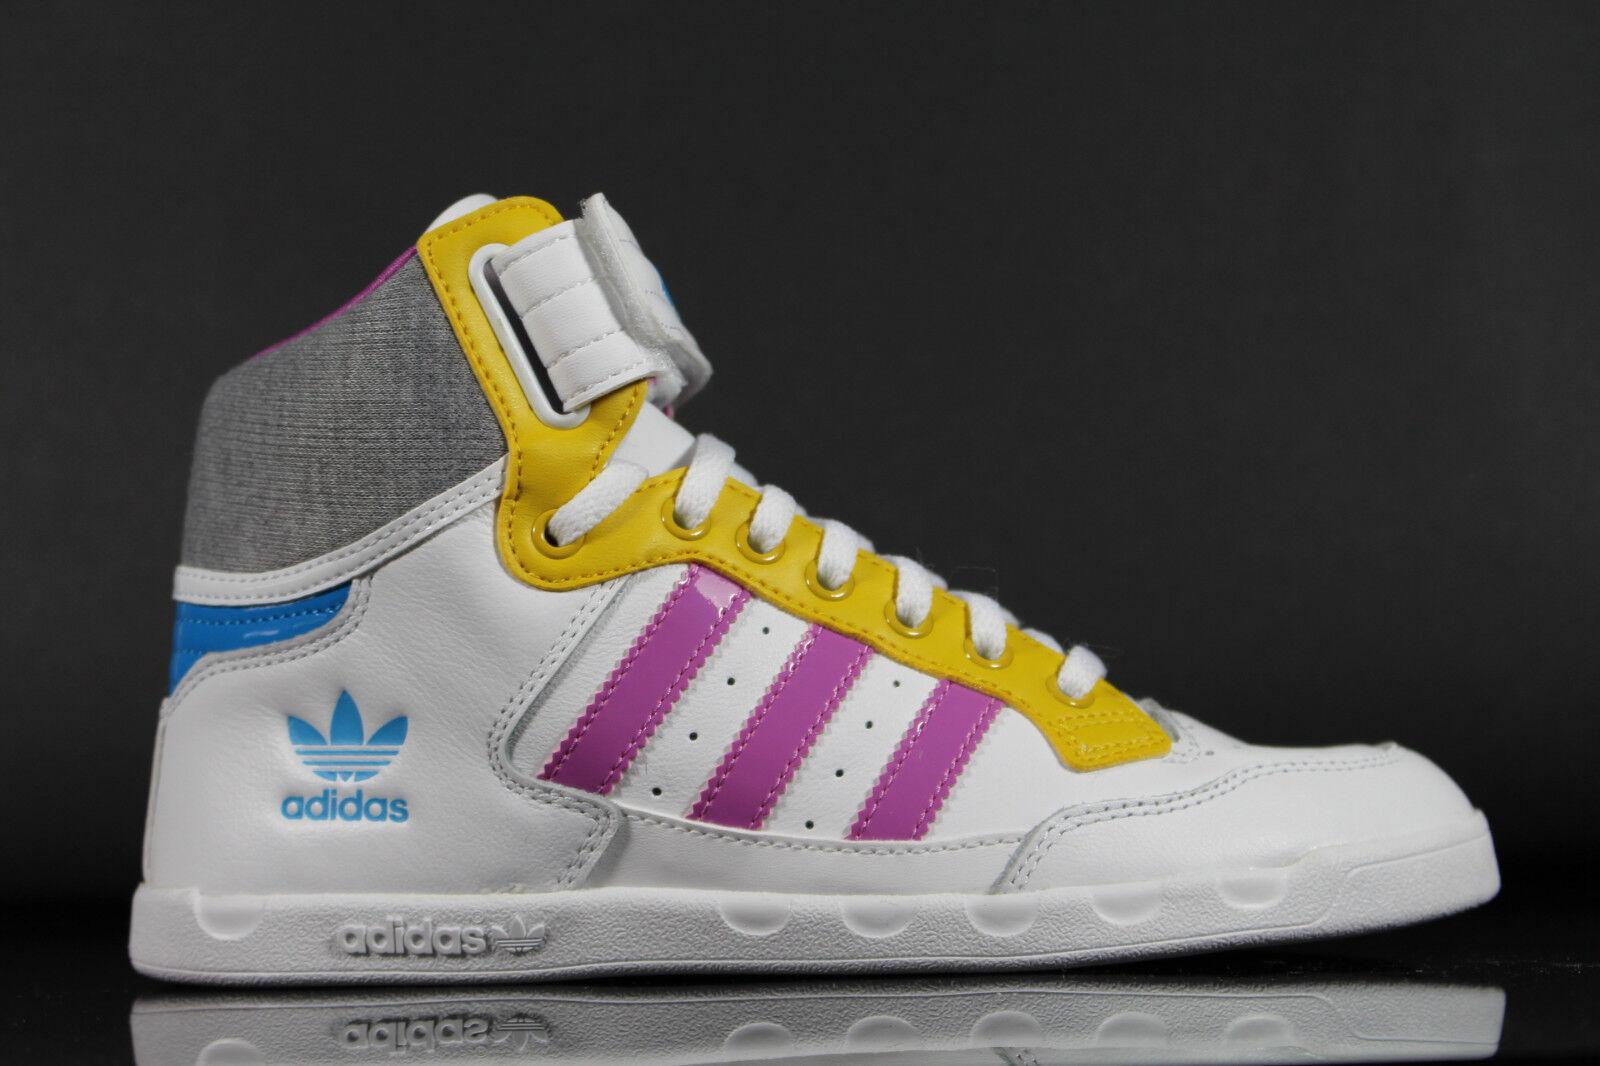 Neu Damen Adidas Centenia Hi W - Originals - Turnschuhe - Sportschuhe - Sneaker